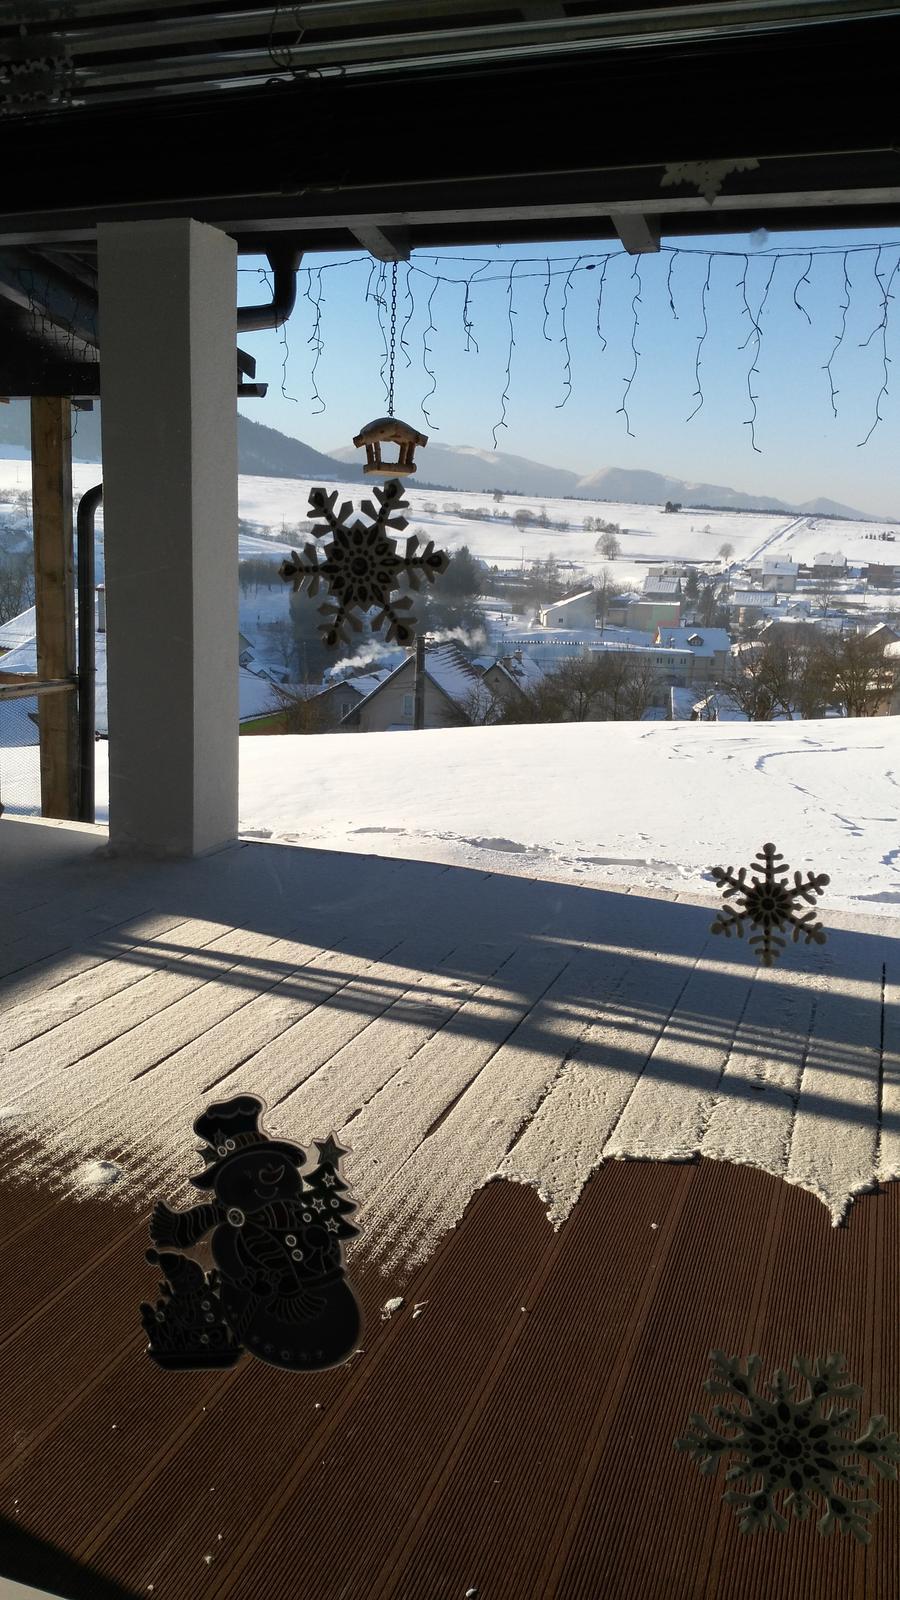 Domček na kopčeku - mrazive rano -25 brrrr